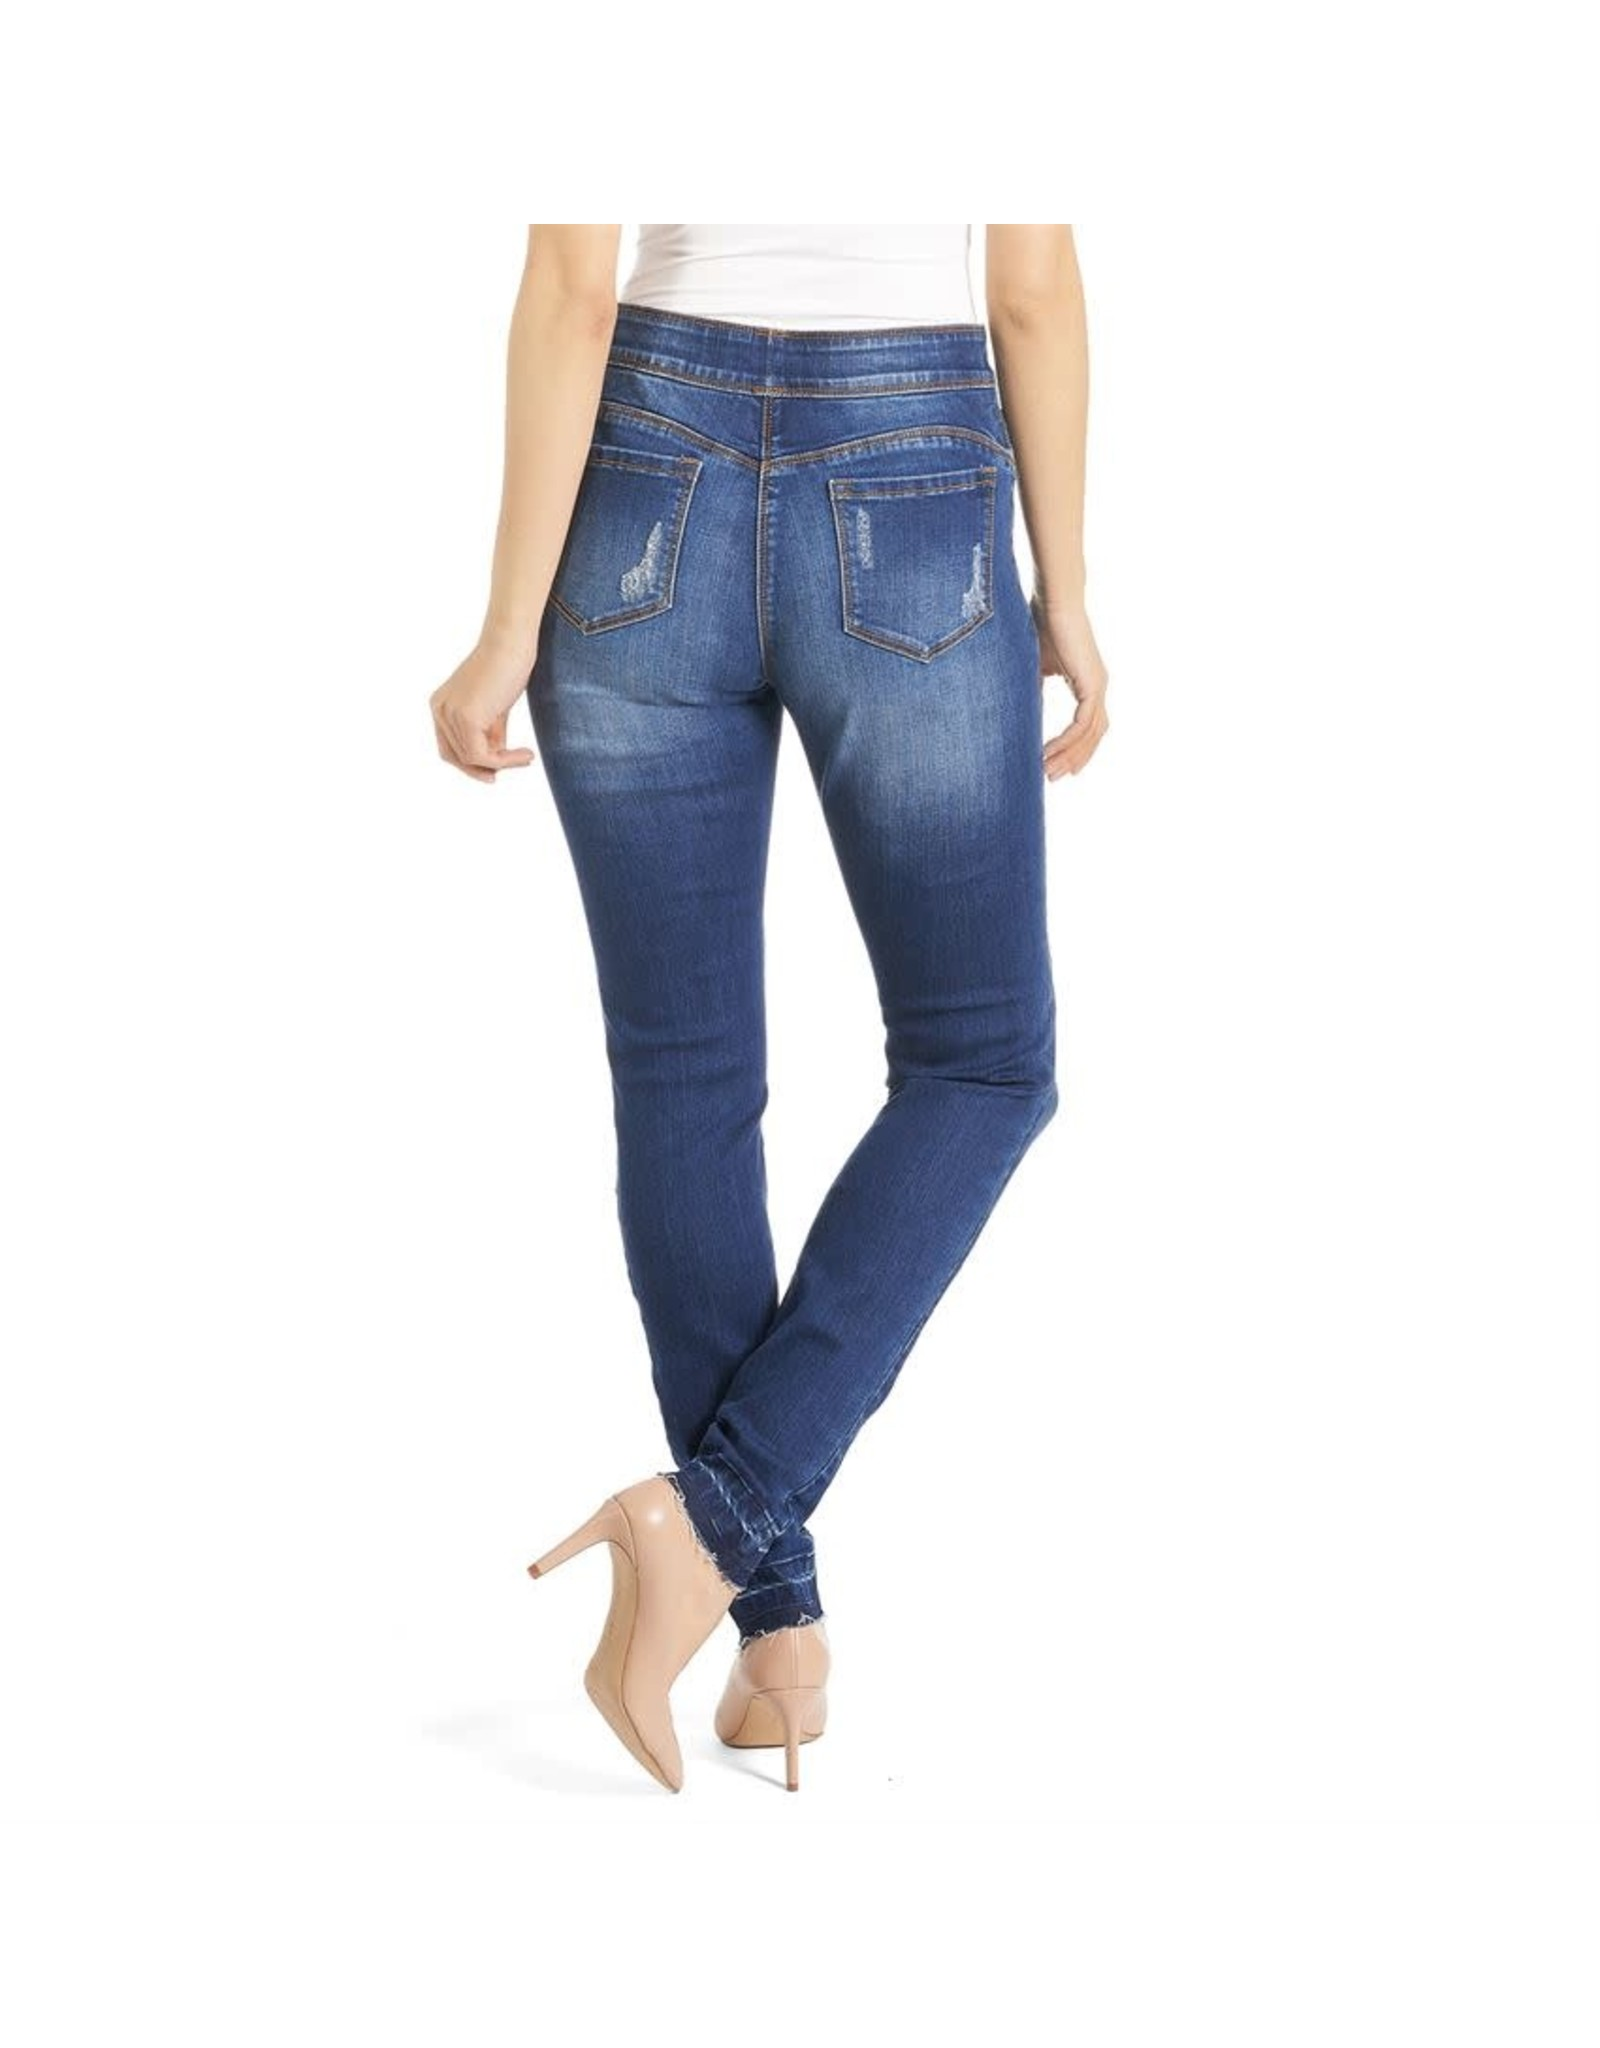 OMG Leopard Patchwork Jeans